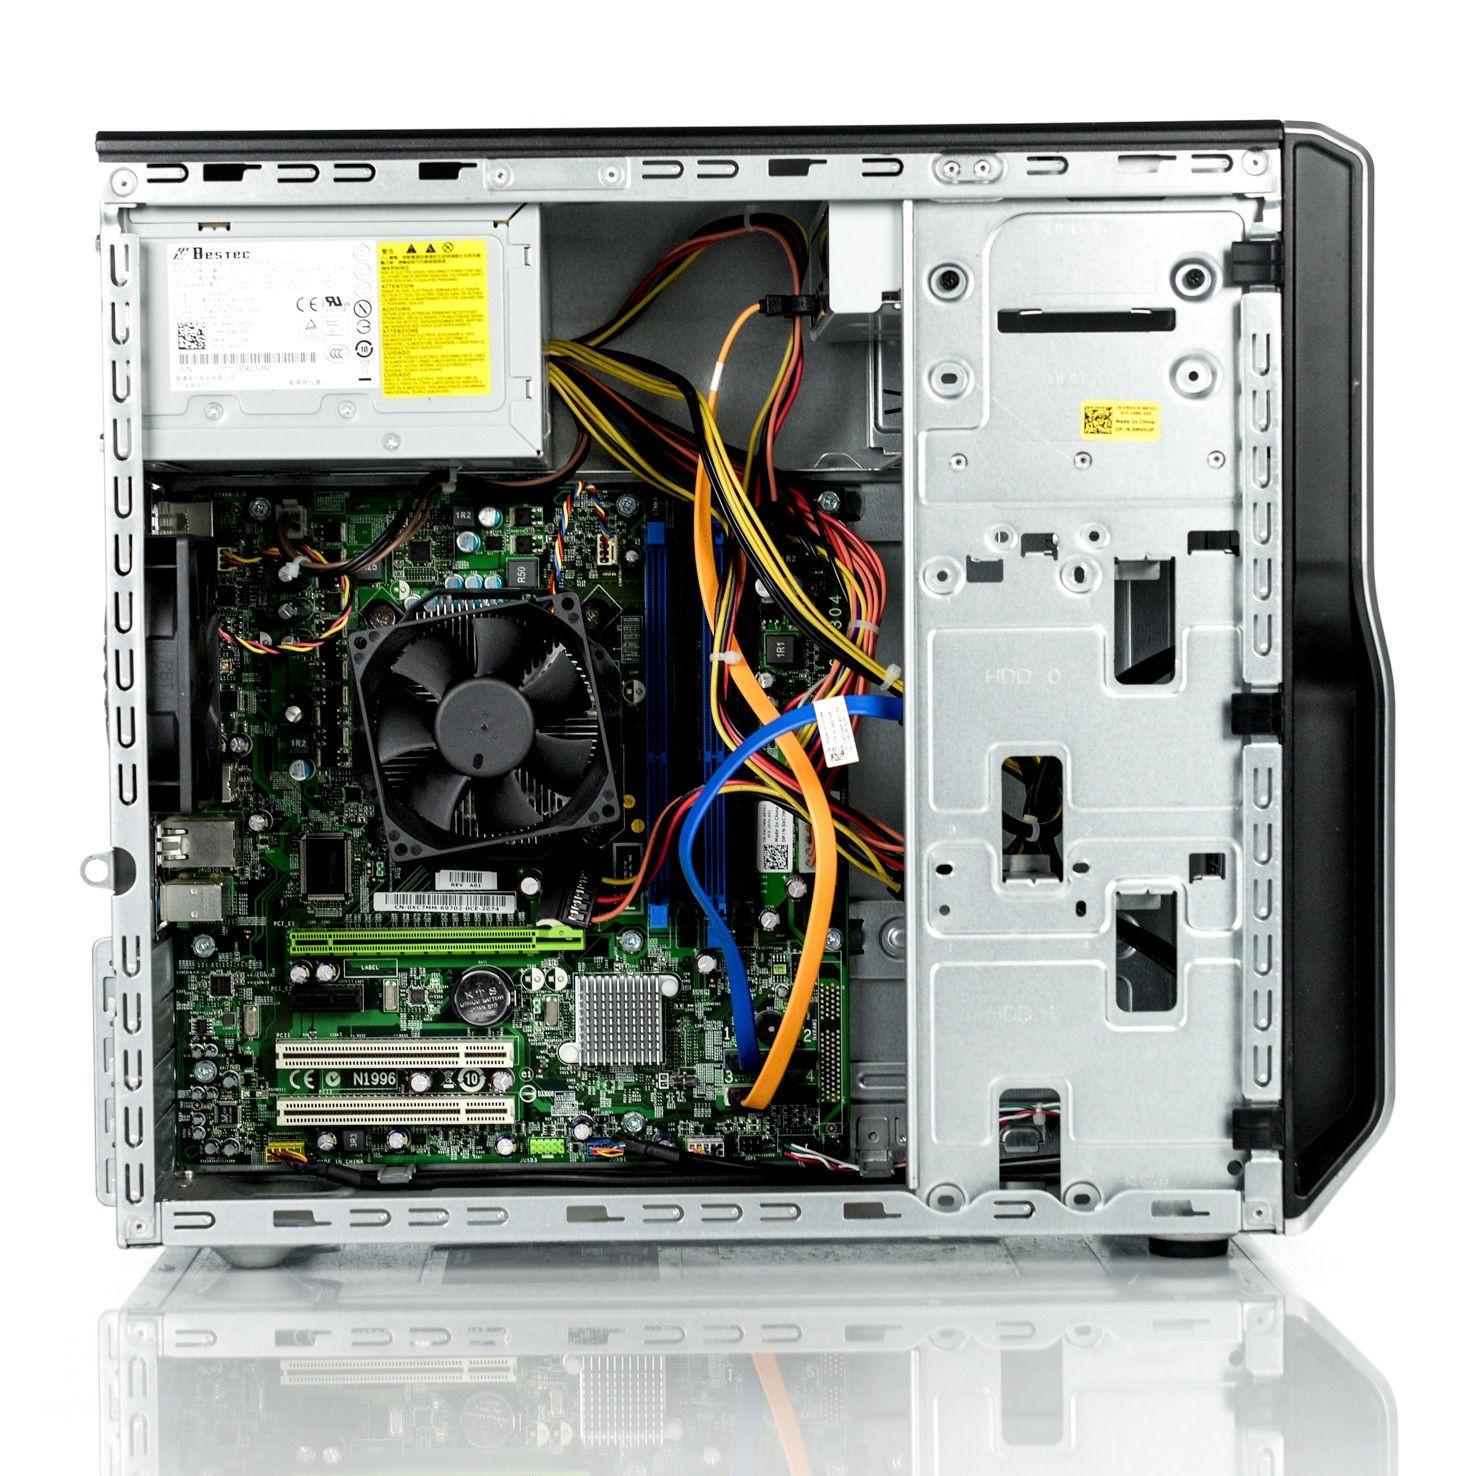 DELL PRECISION T1500 ETHERNET DRIVERS PC